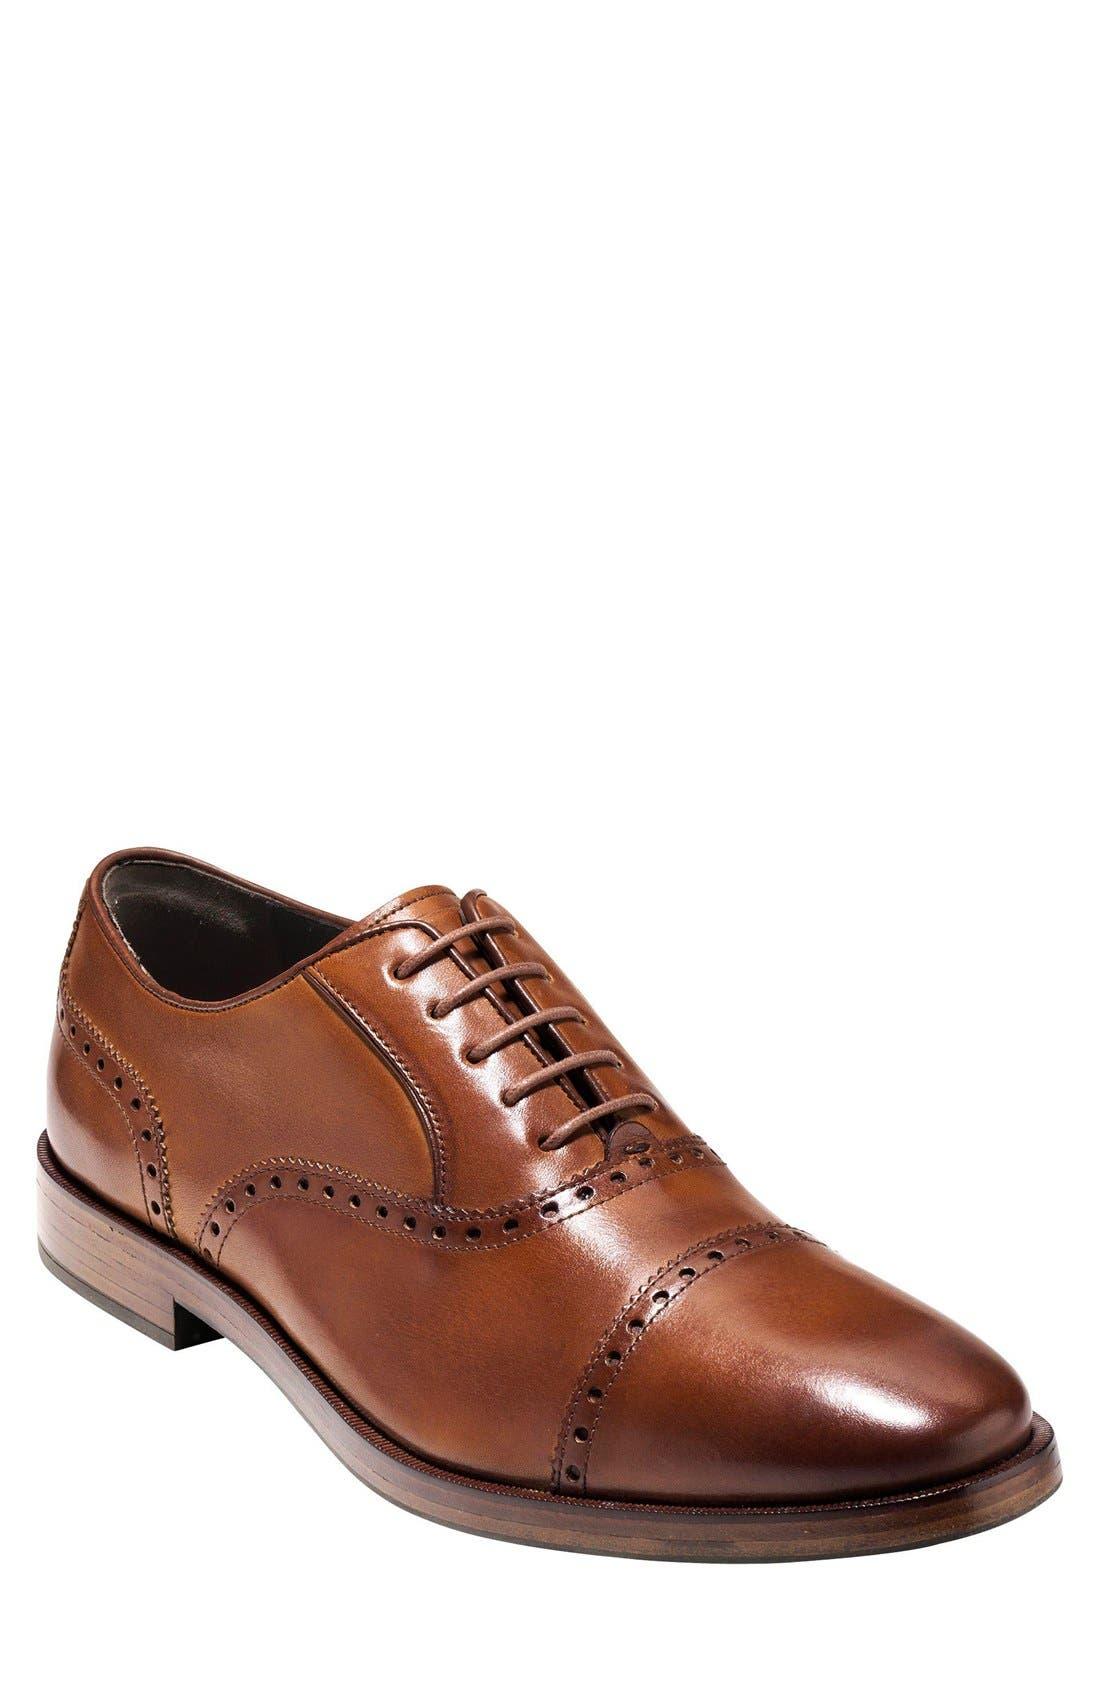 'Hamilton' Cap Toe Oxford,                             Main thumbnail 1, color,                             British Tan Leather